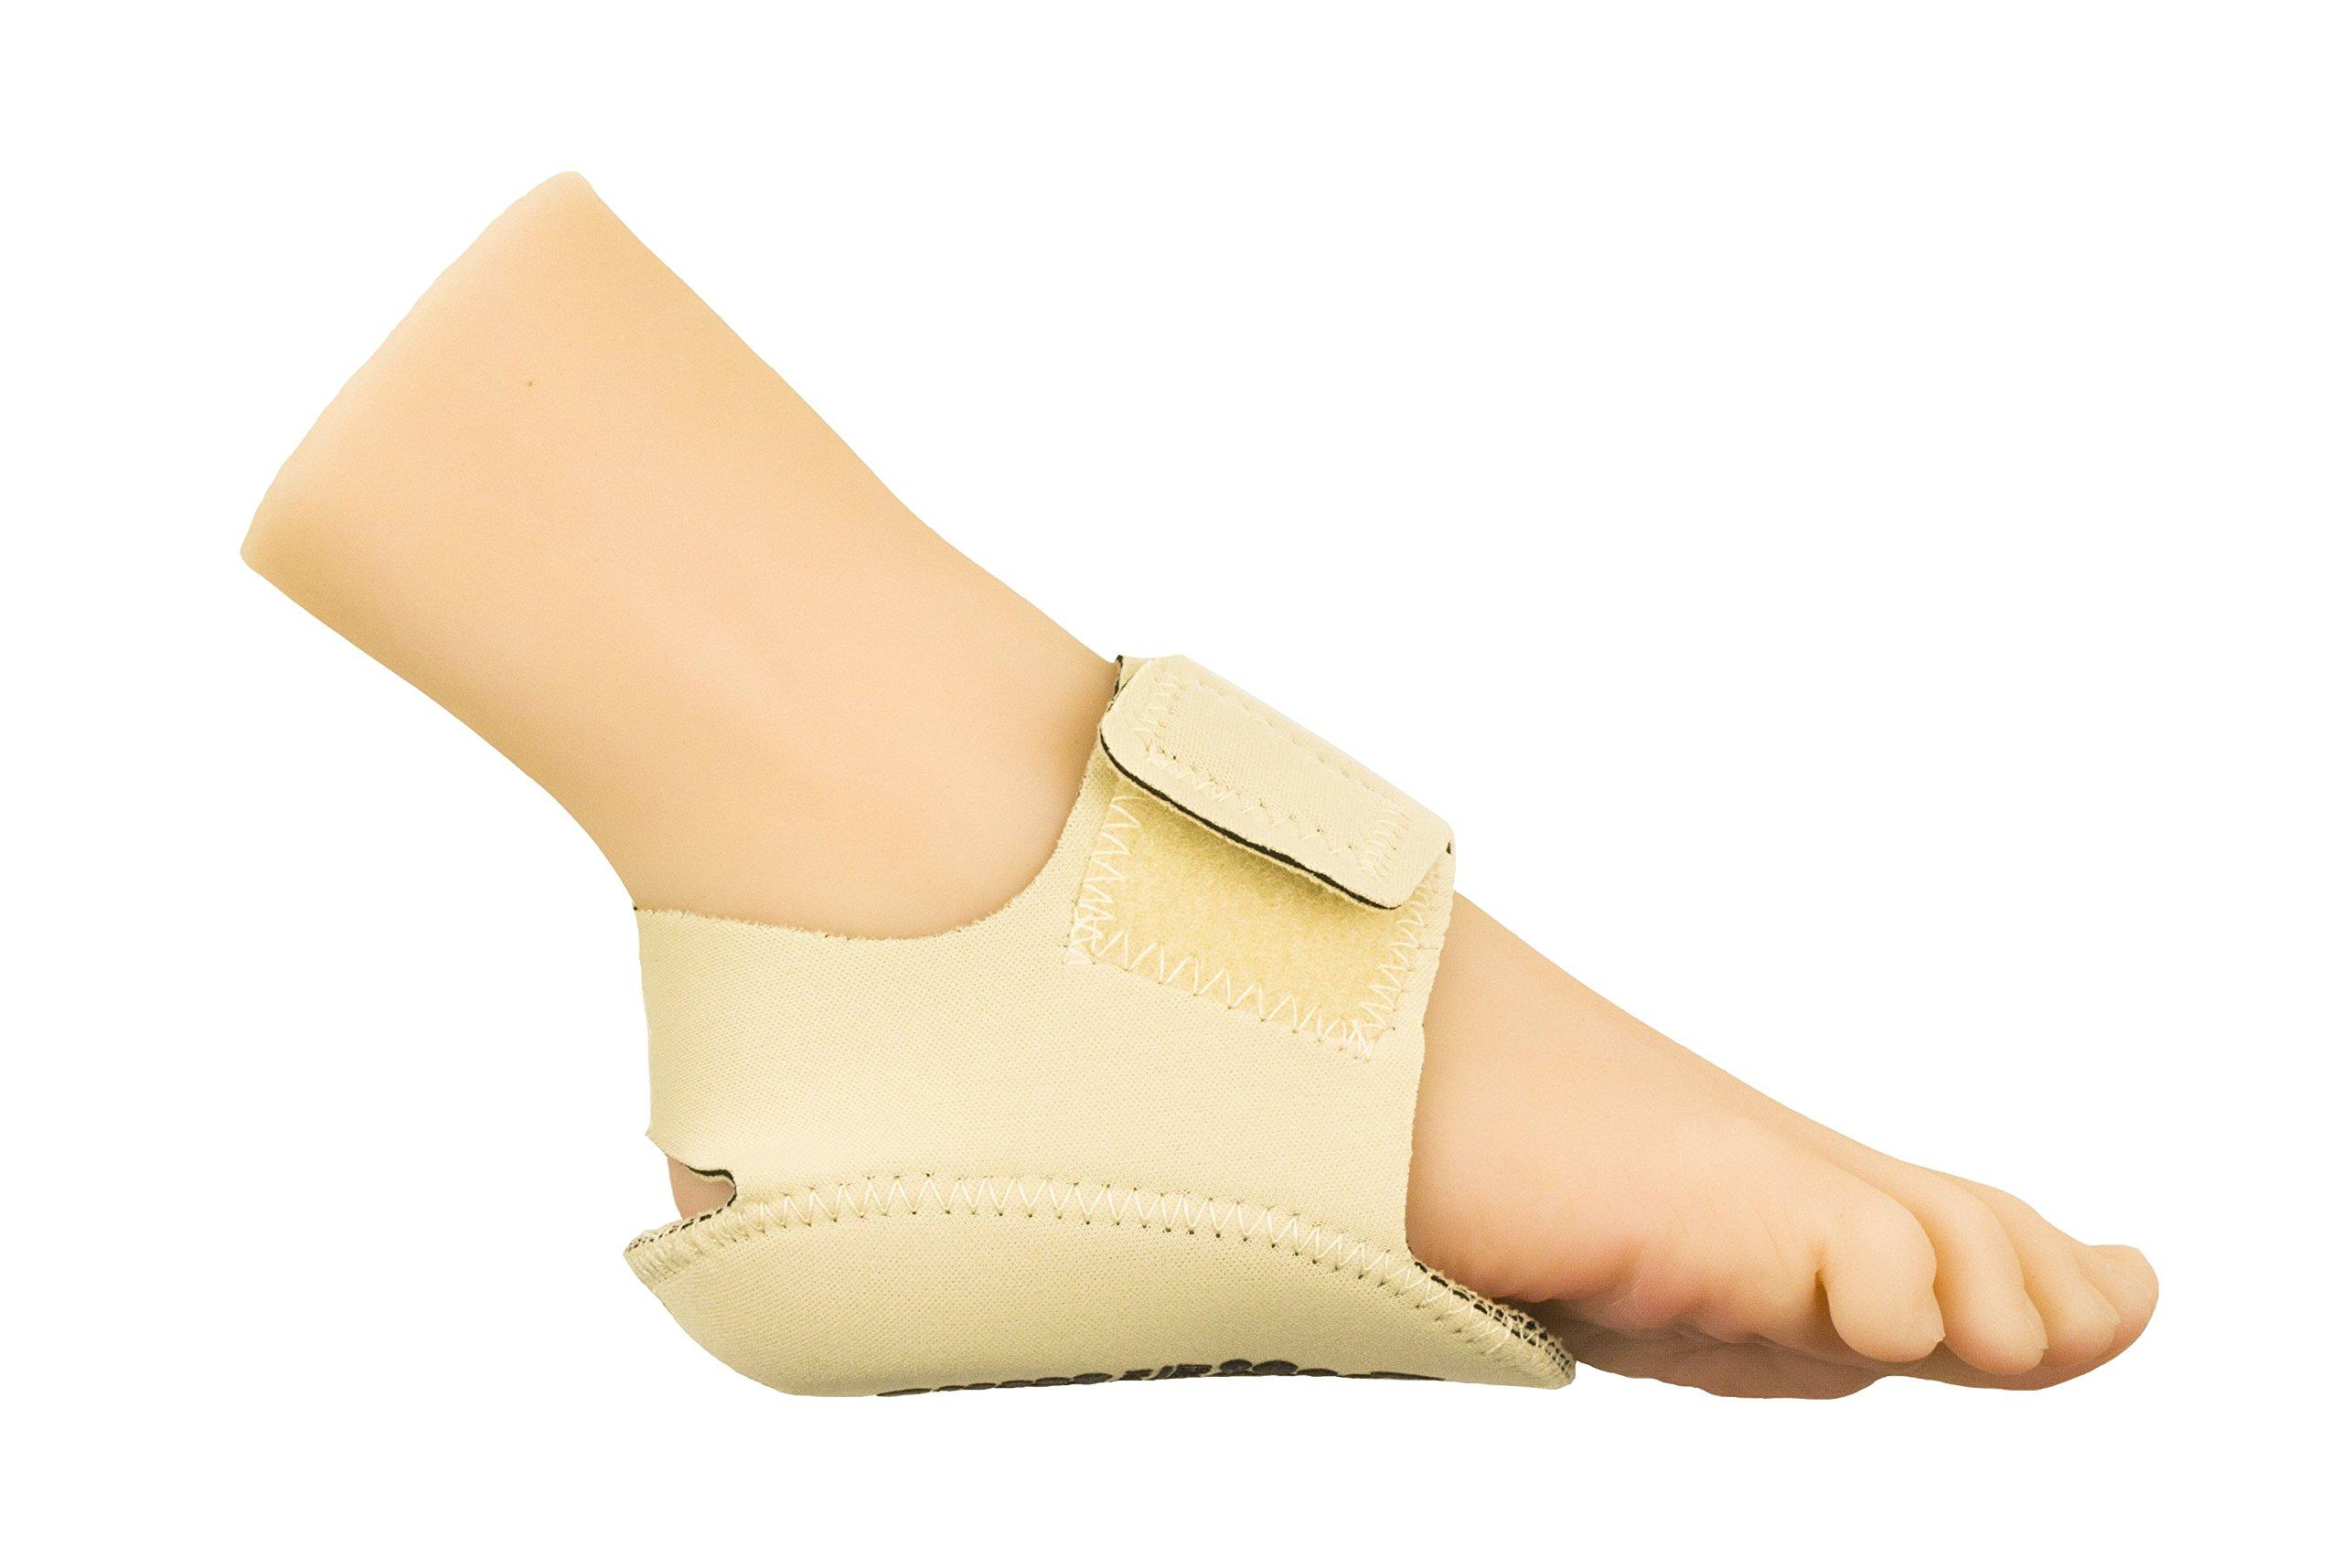 Heel That Pain Heel Seat Wraps for Plantar Fasciitis and Heel Spurs (Medium)